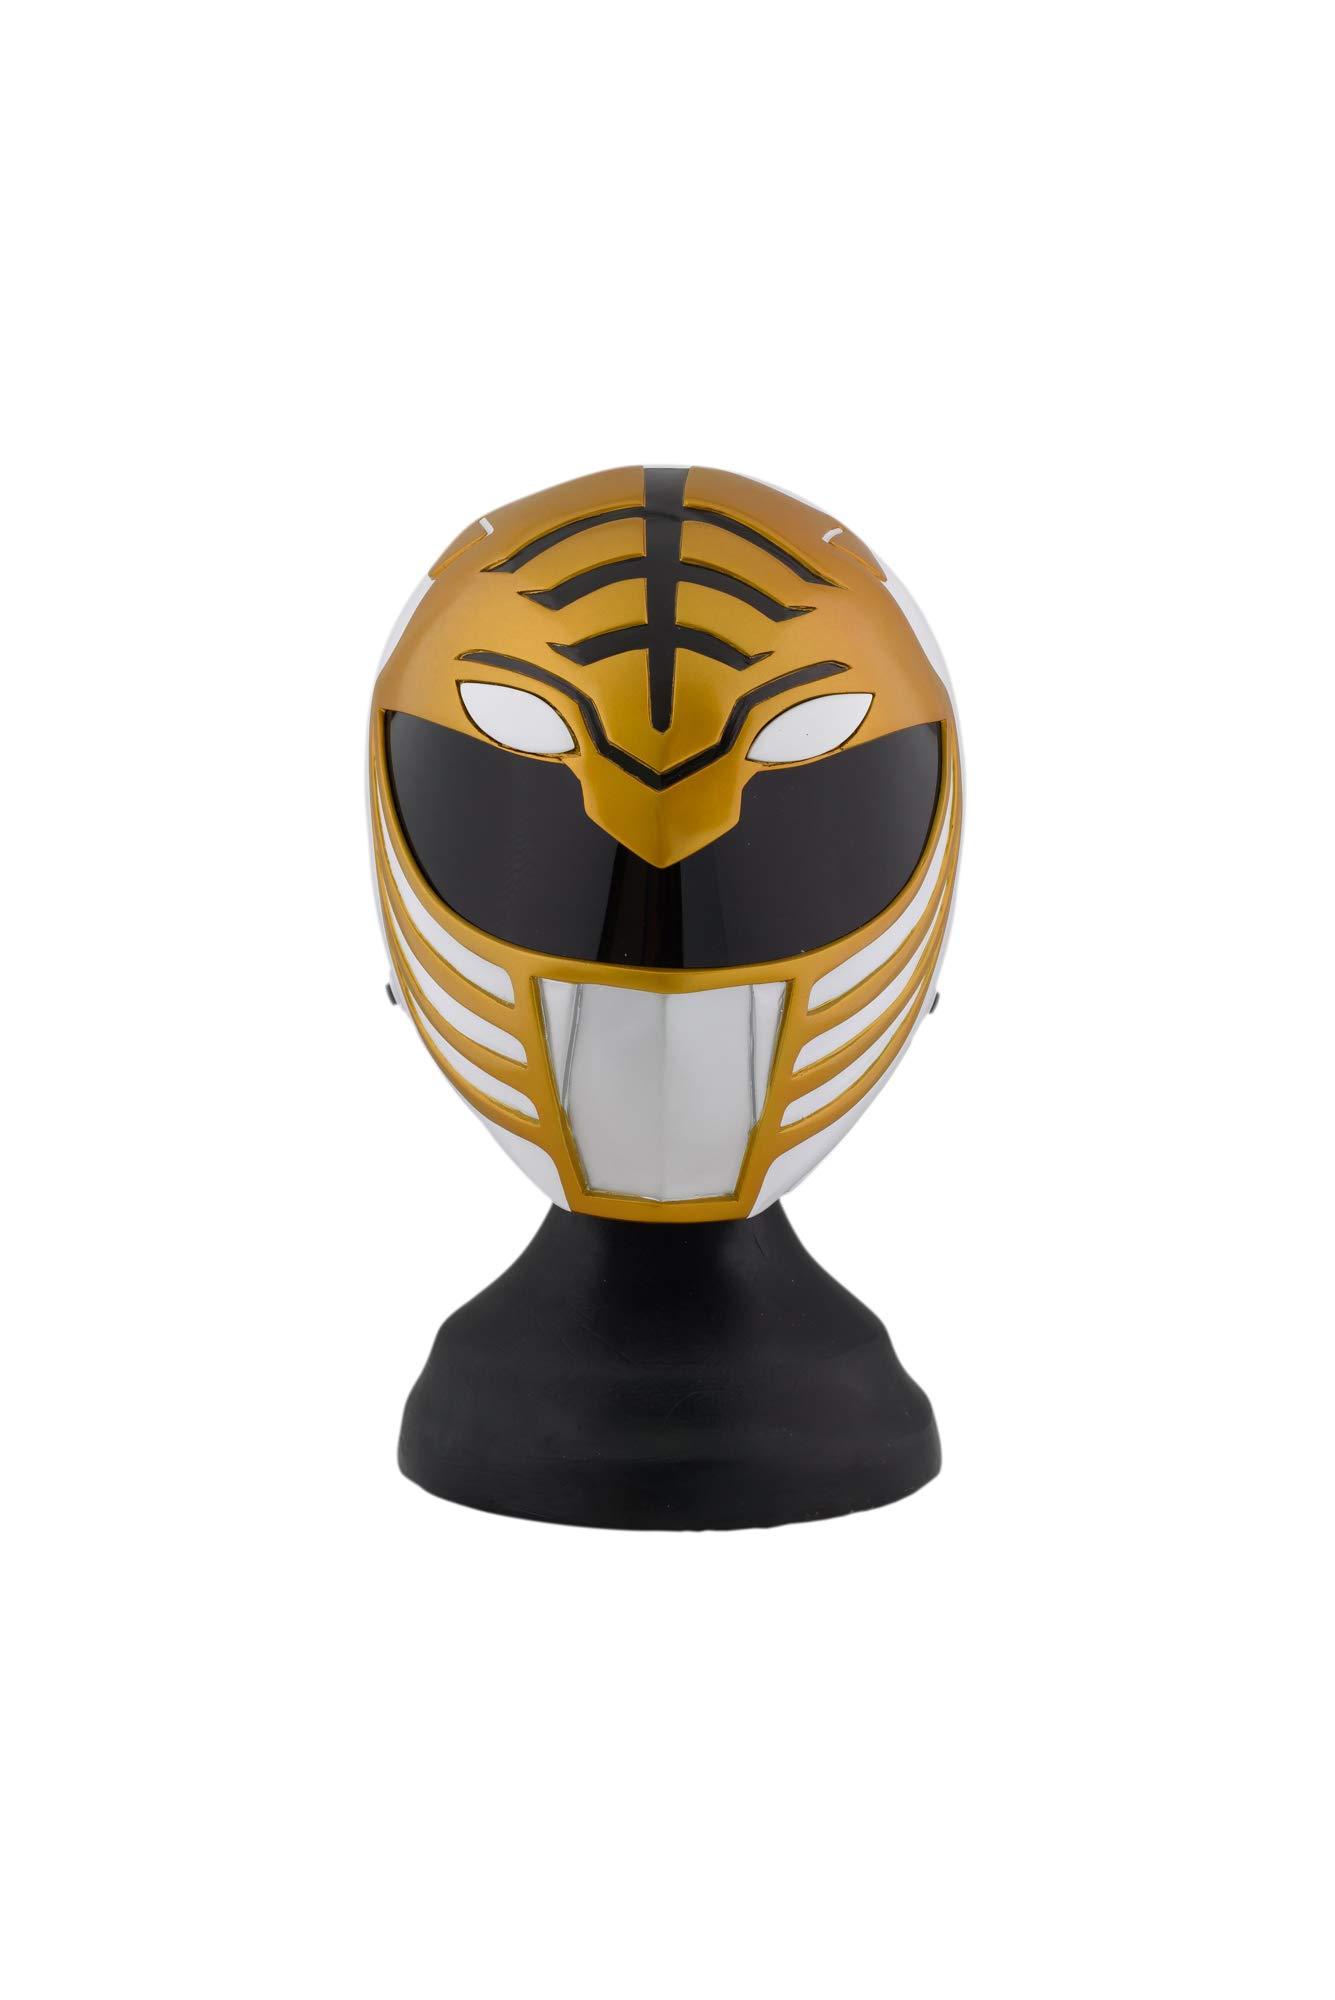 HOTMODELTOY White Tiger Fiberglass Helmet Cosplay Life Size